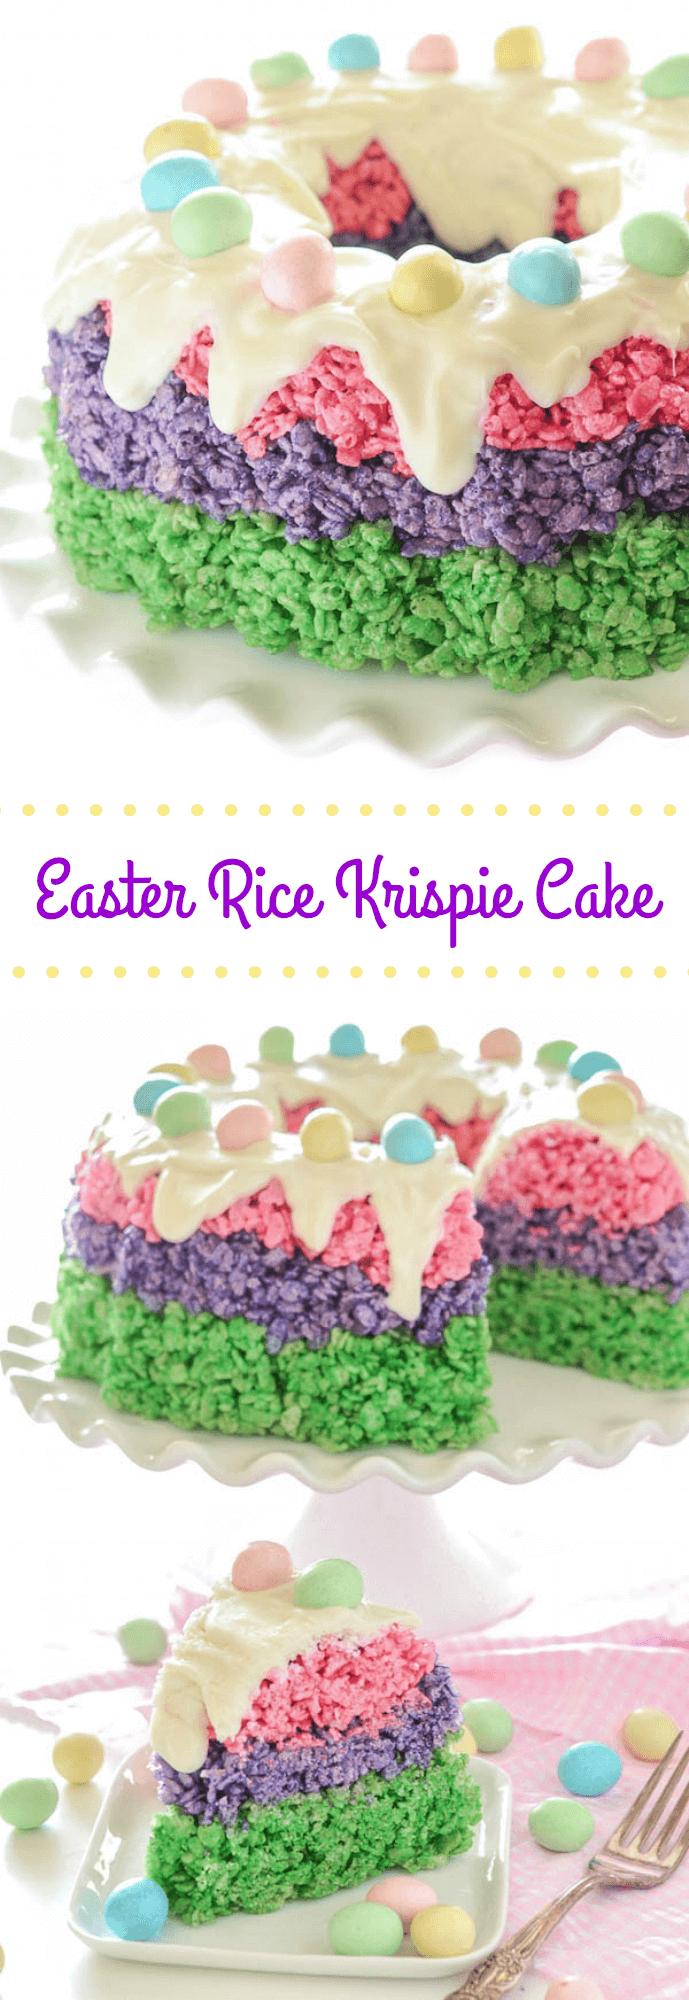 Easter Rice Krispie Cake The Novice Chef